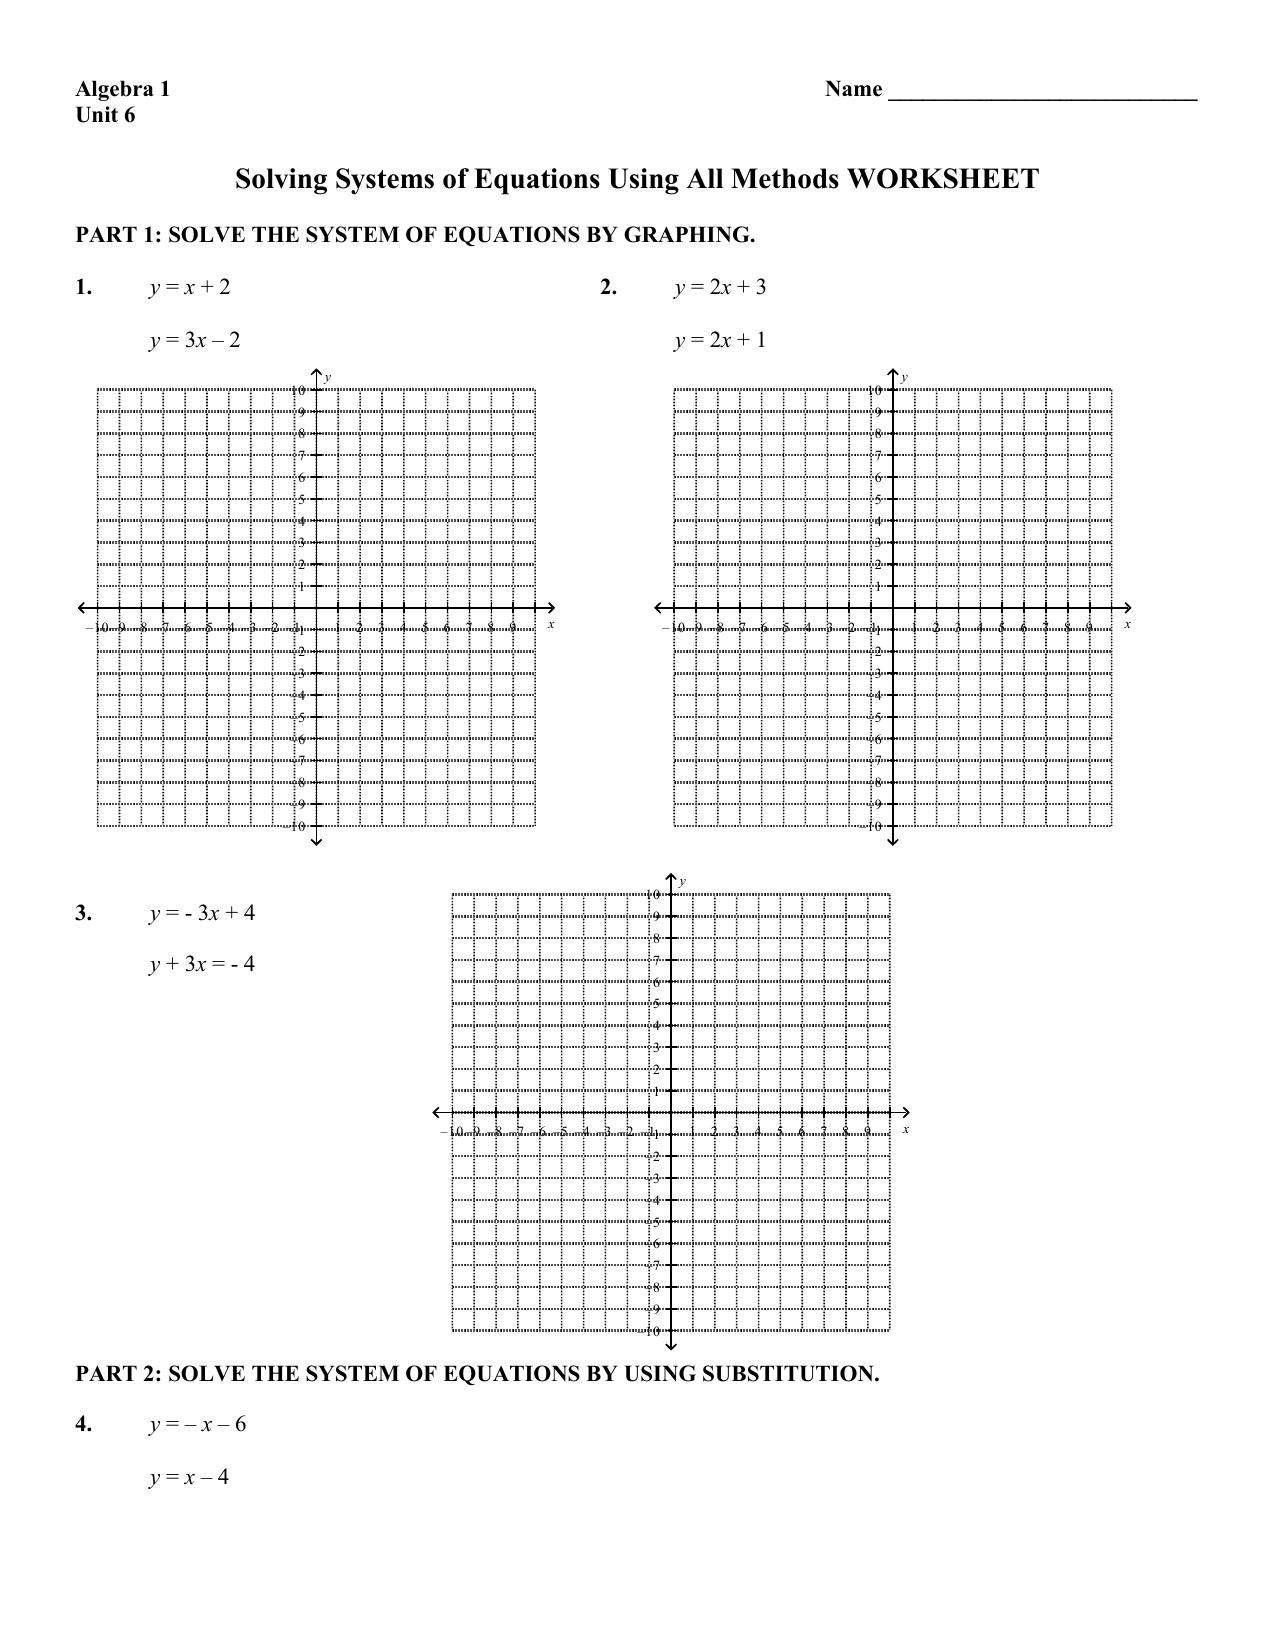 Worksheet Answer Keys Mathconceptualized | Solving Linear